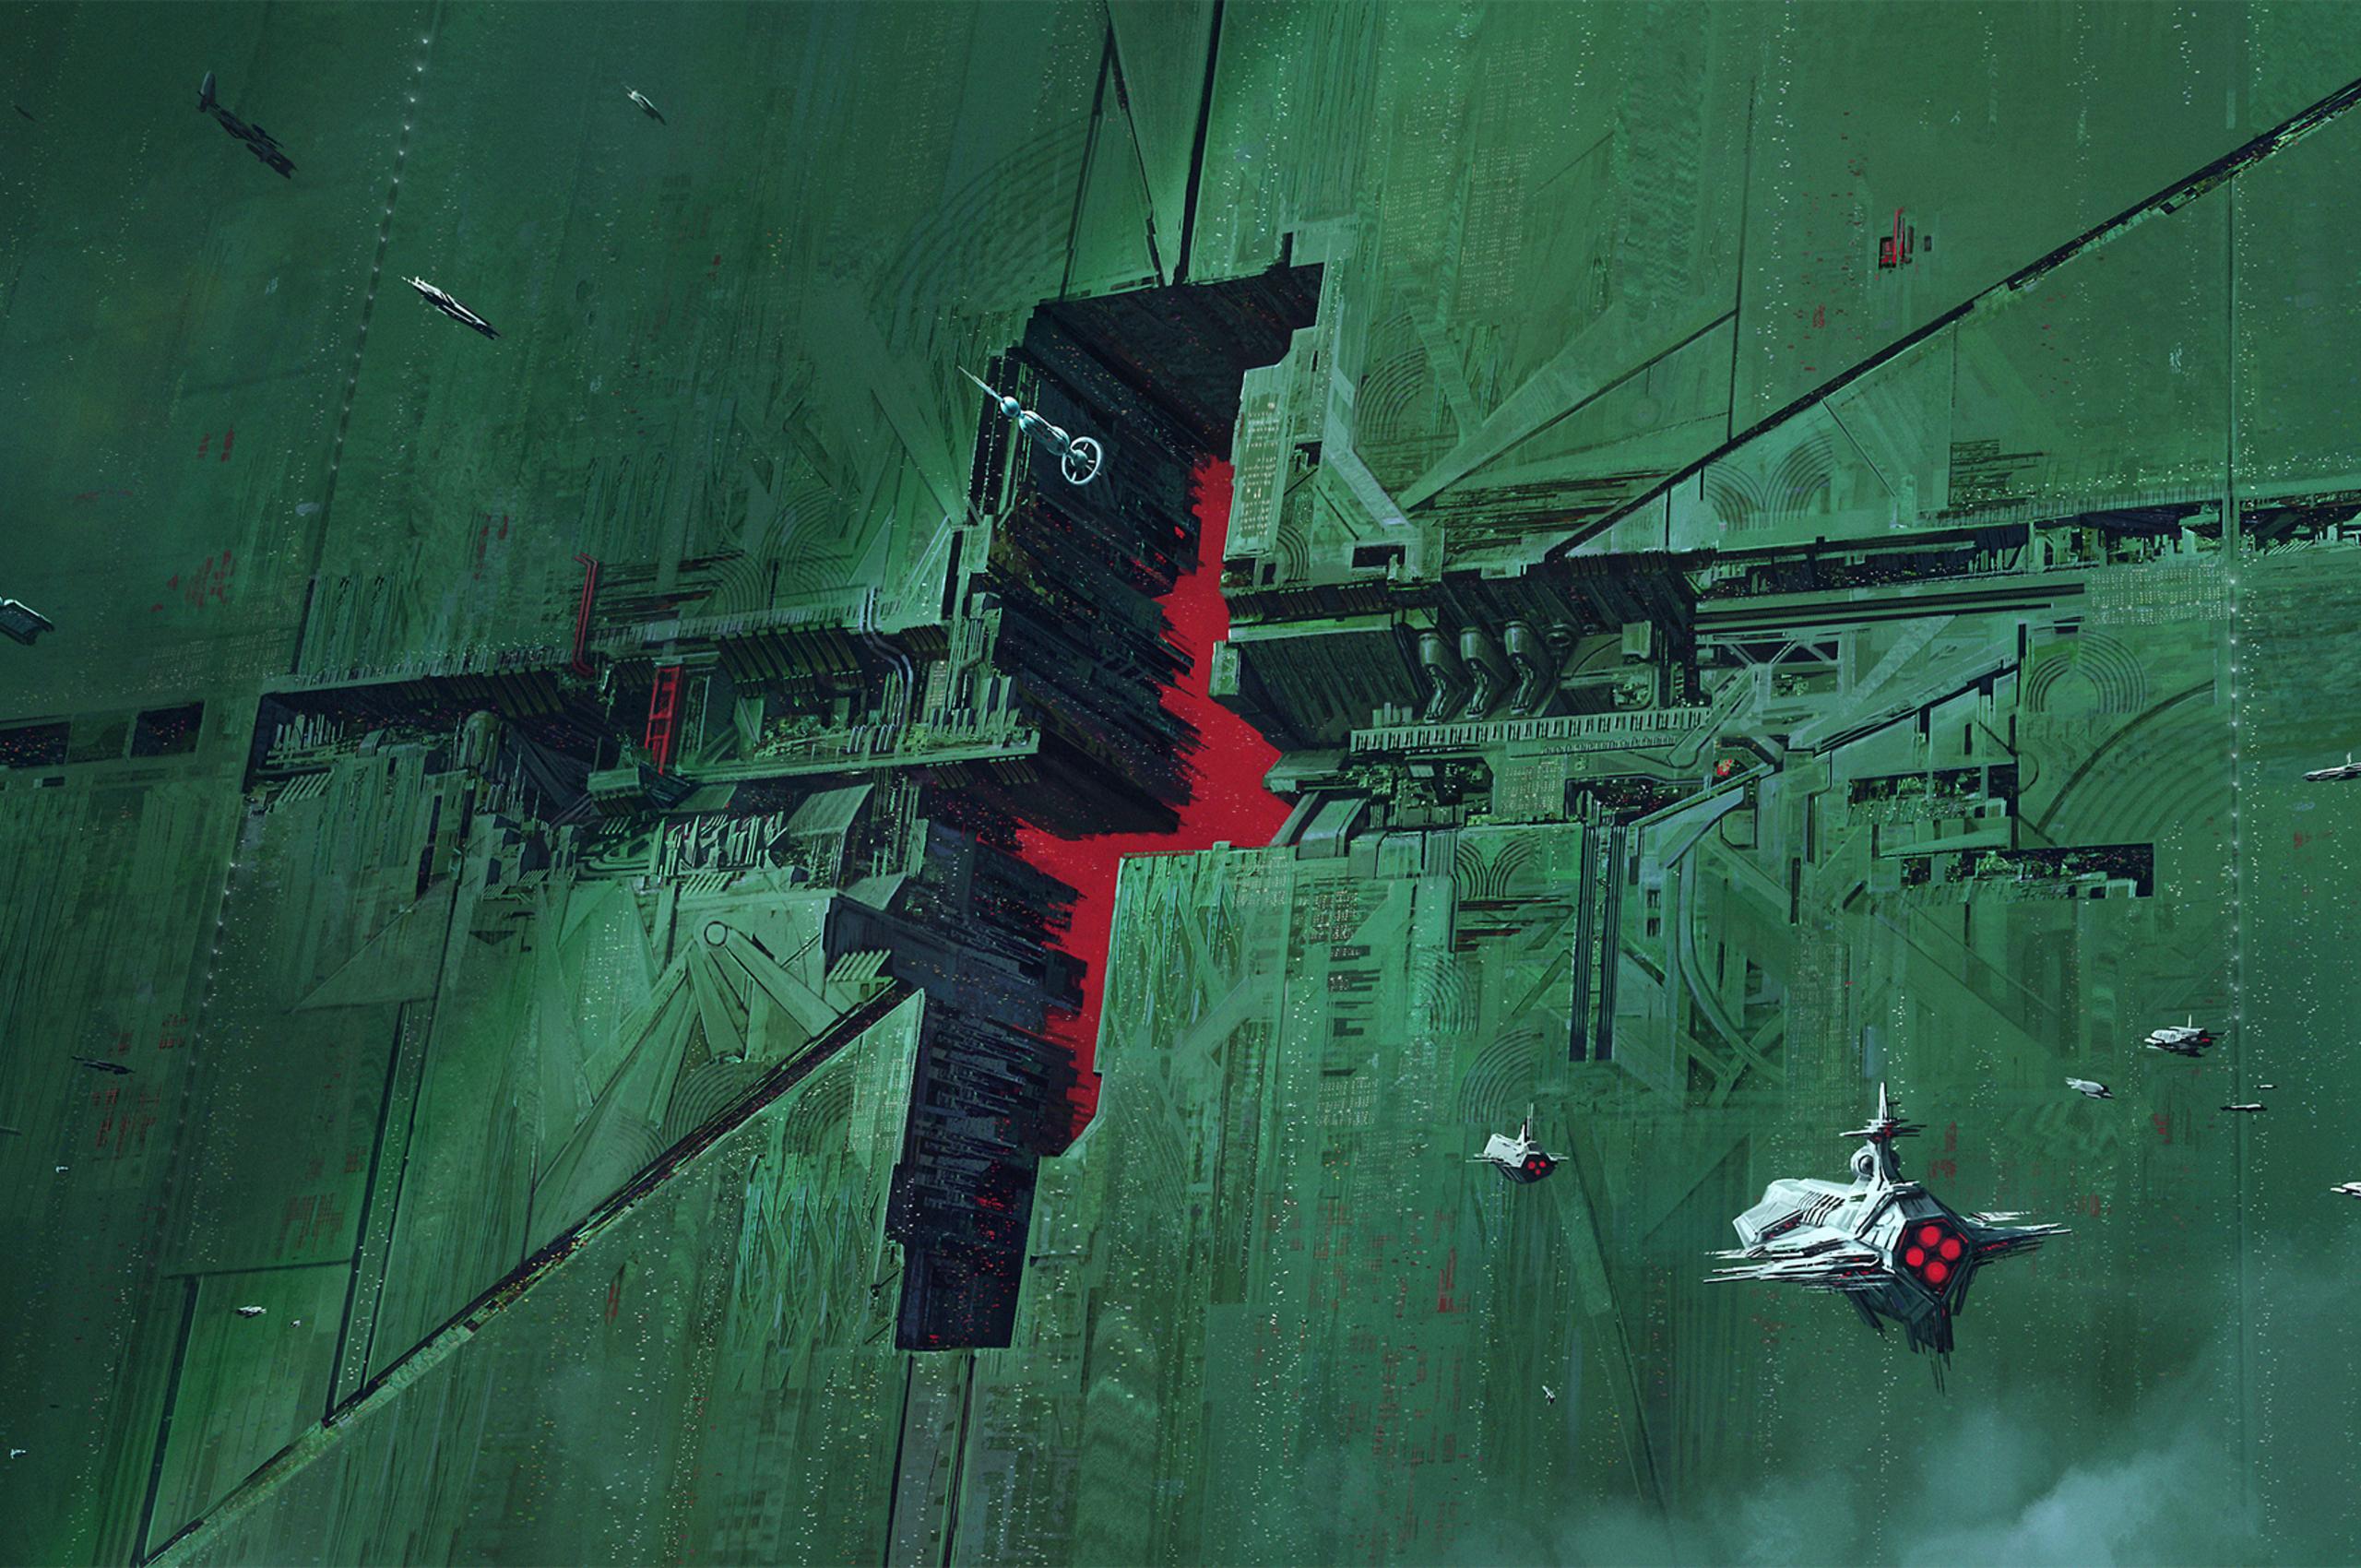 space-ship-scifi-digital-art-wall-29.jpg